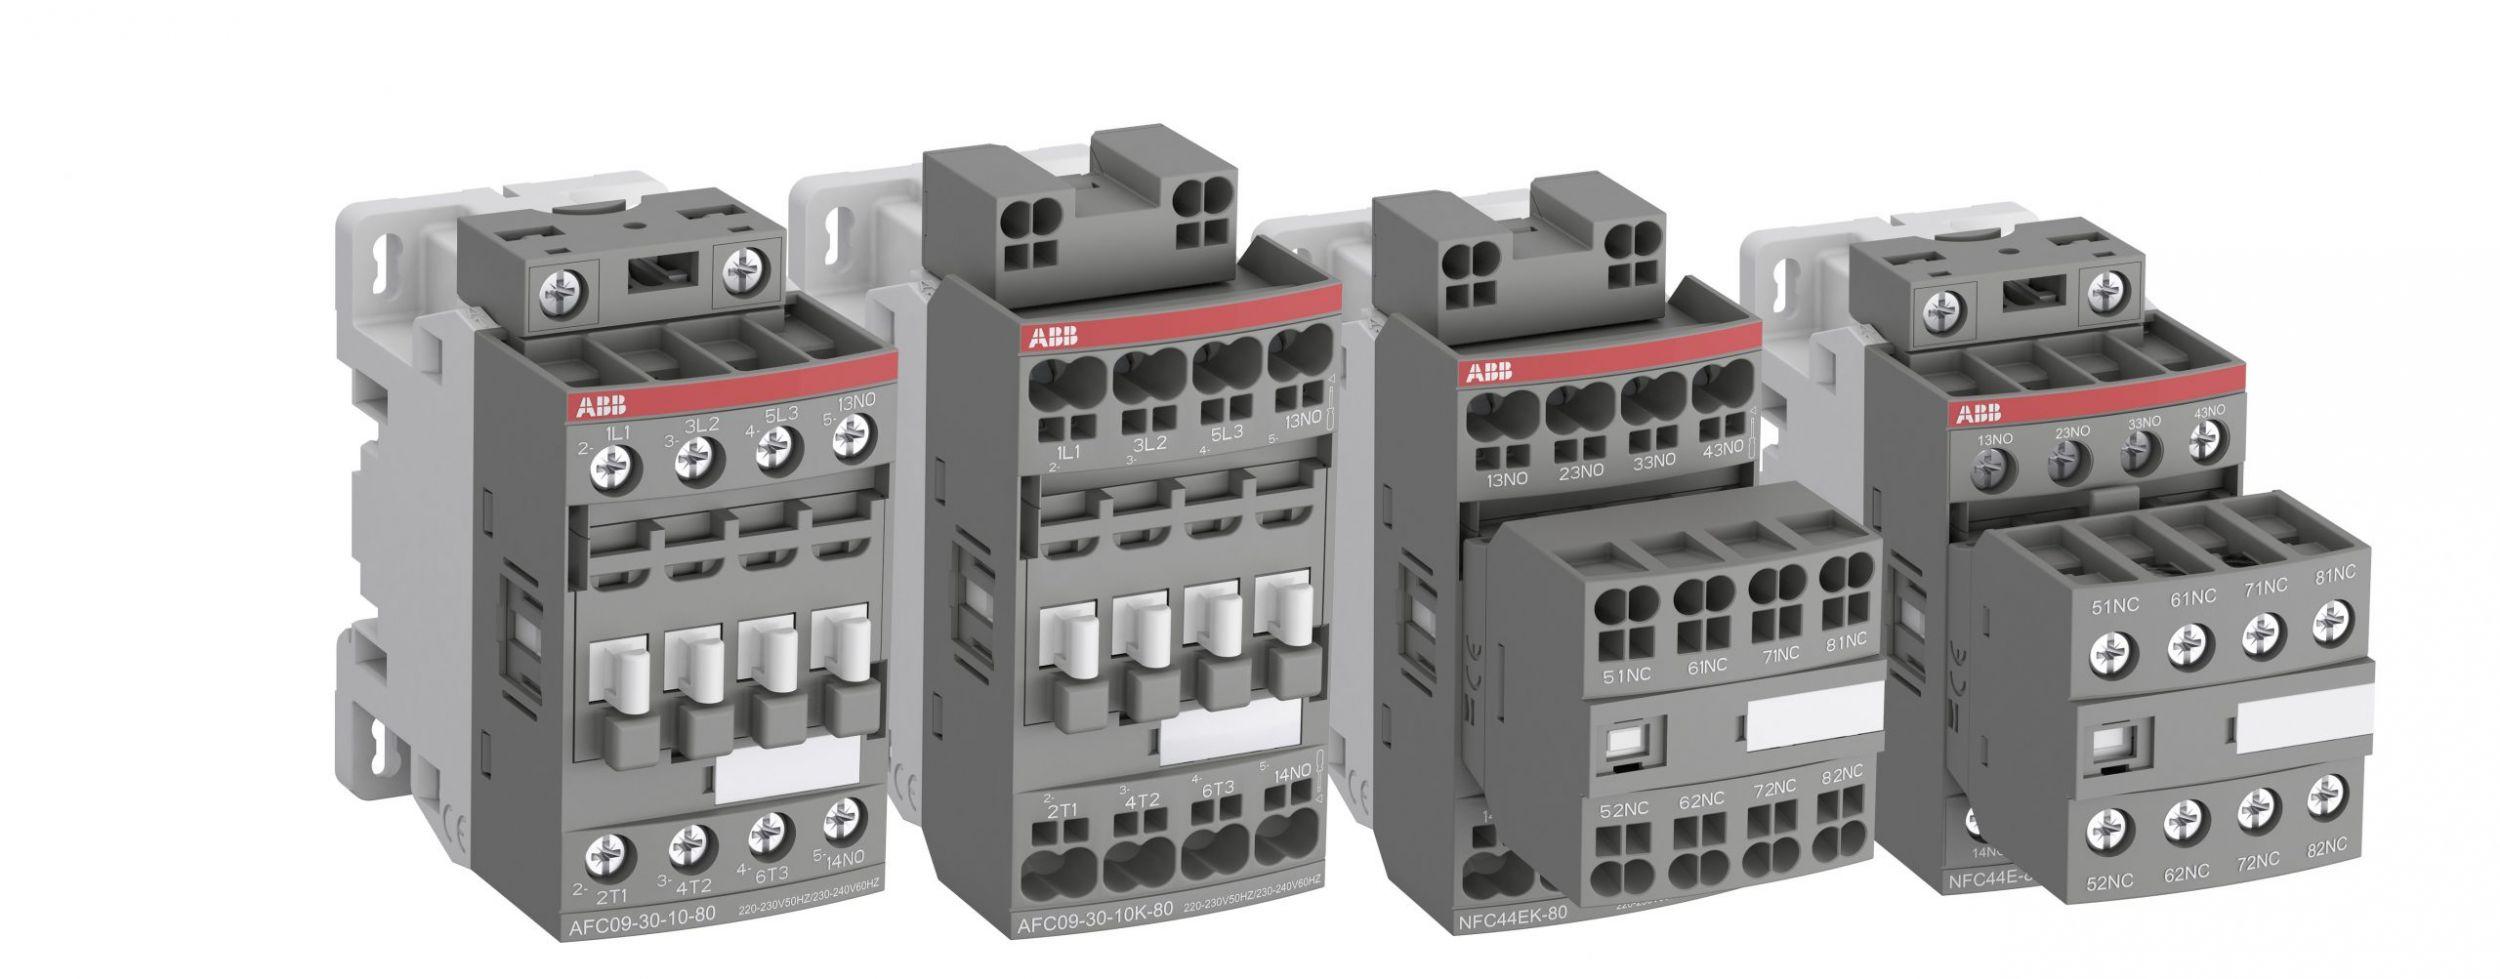 Neues Energiemanagement-System